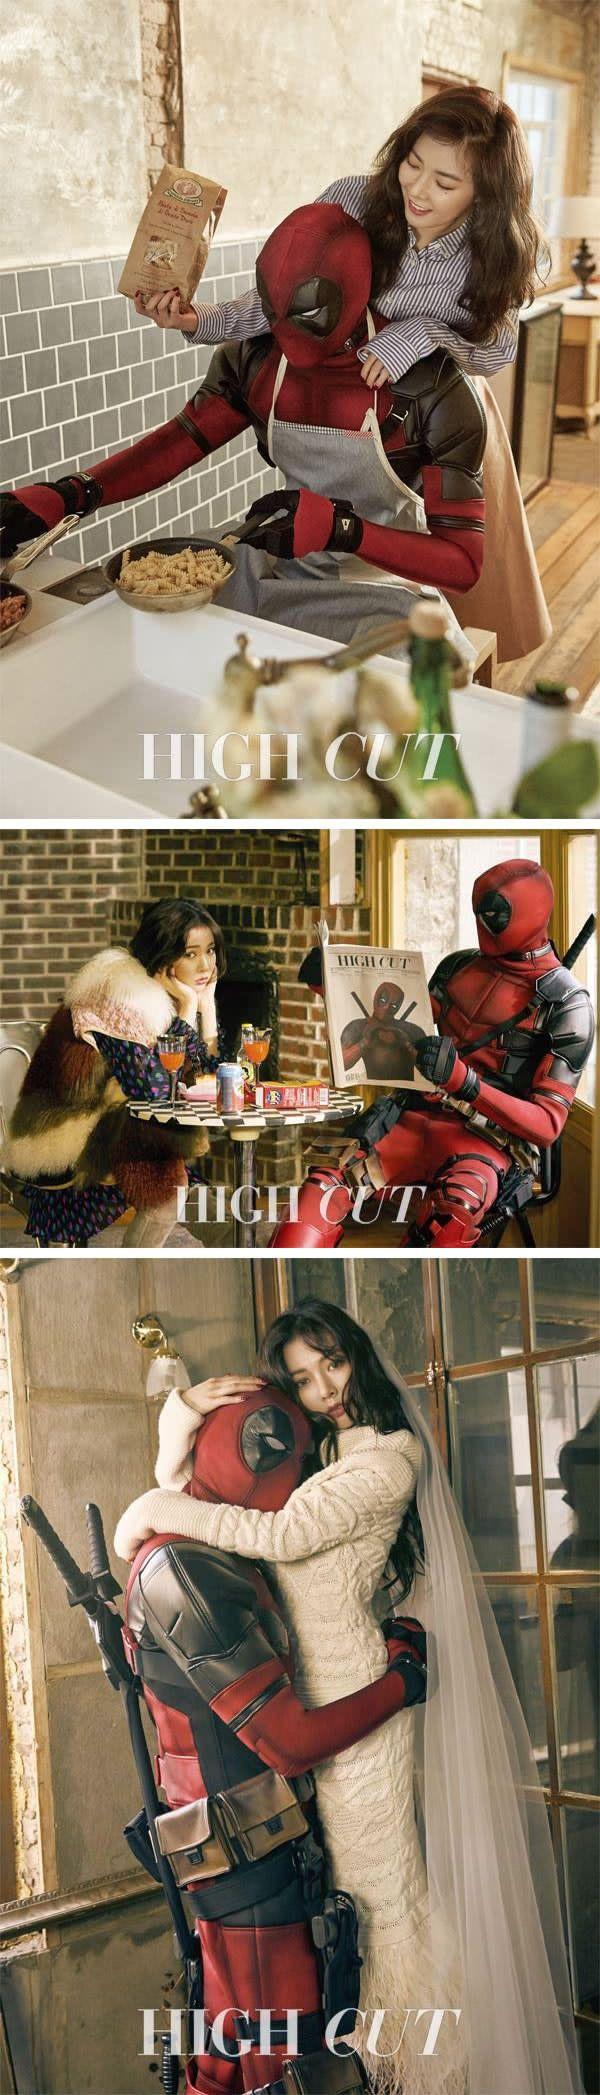 Deadpool marries K-pop star HyunA